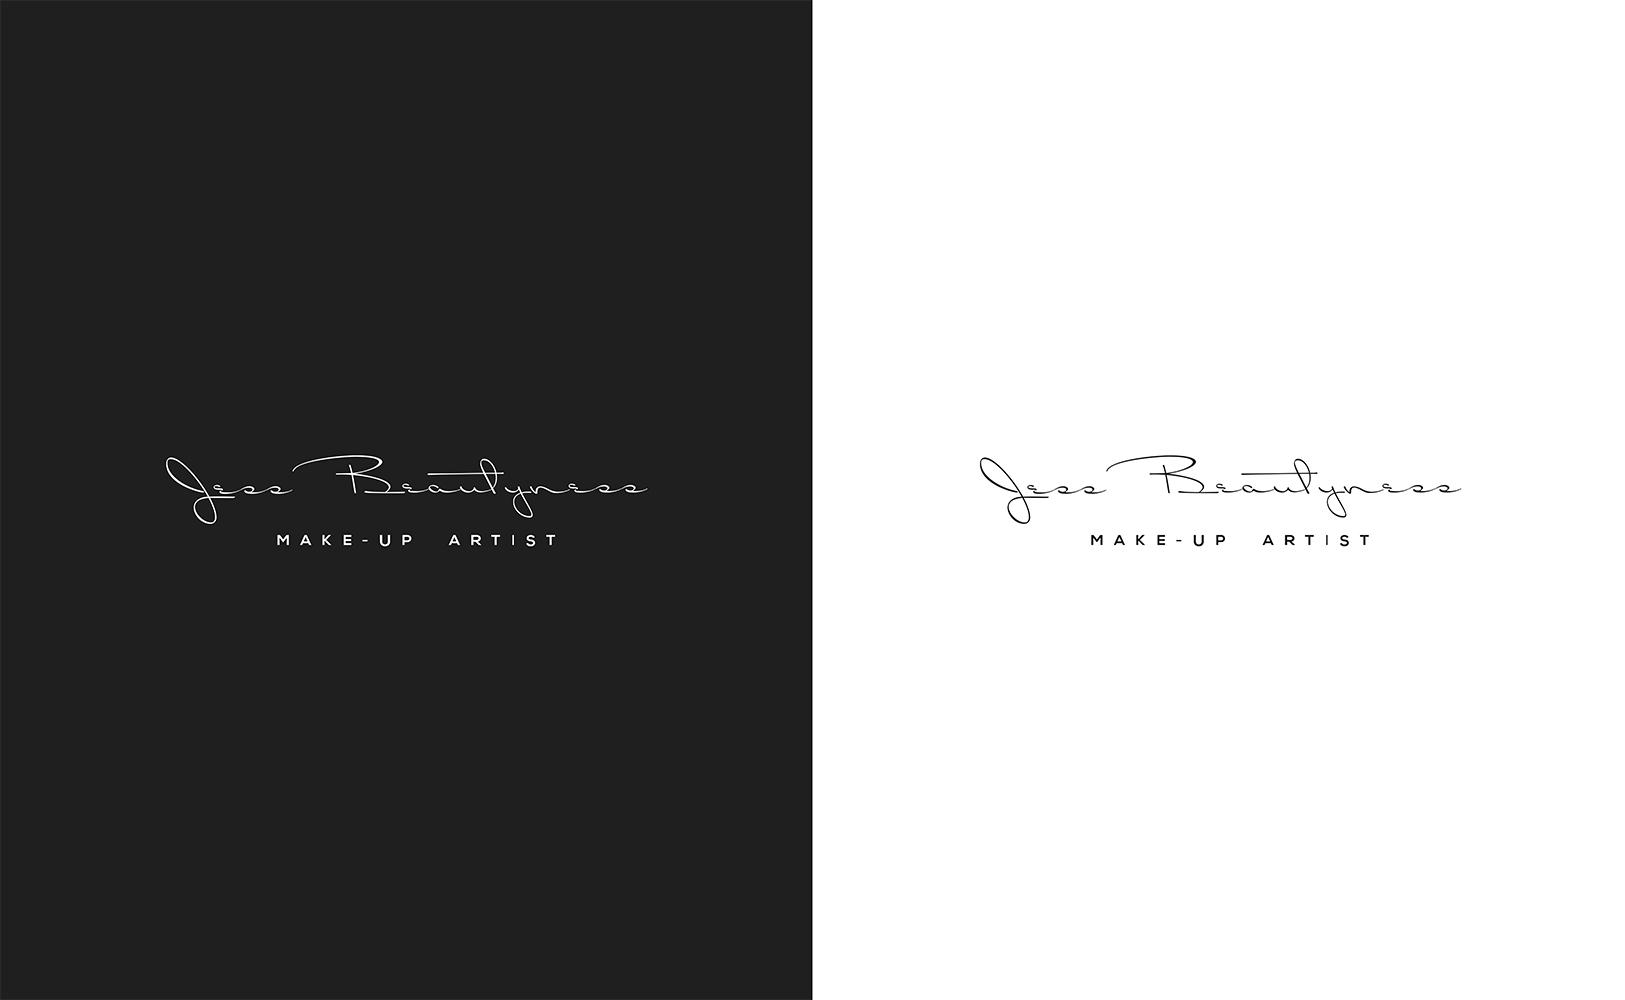 jess-beautyness-logo-black-white